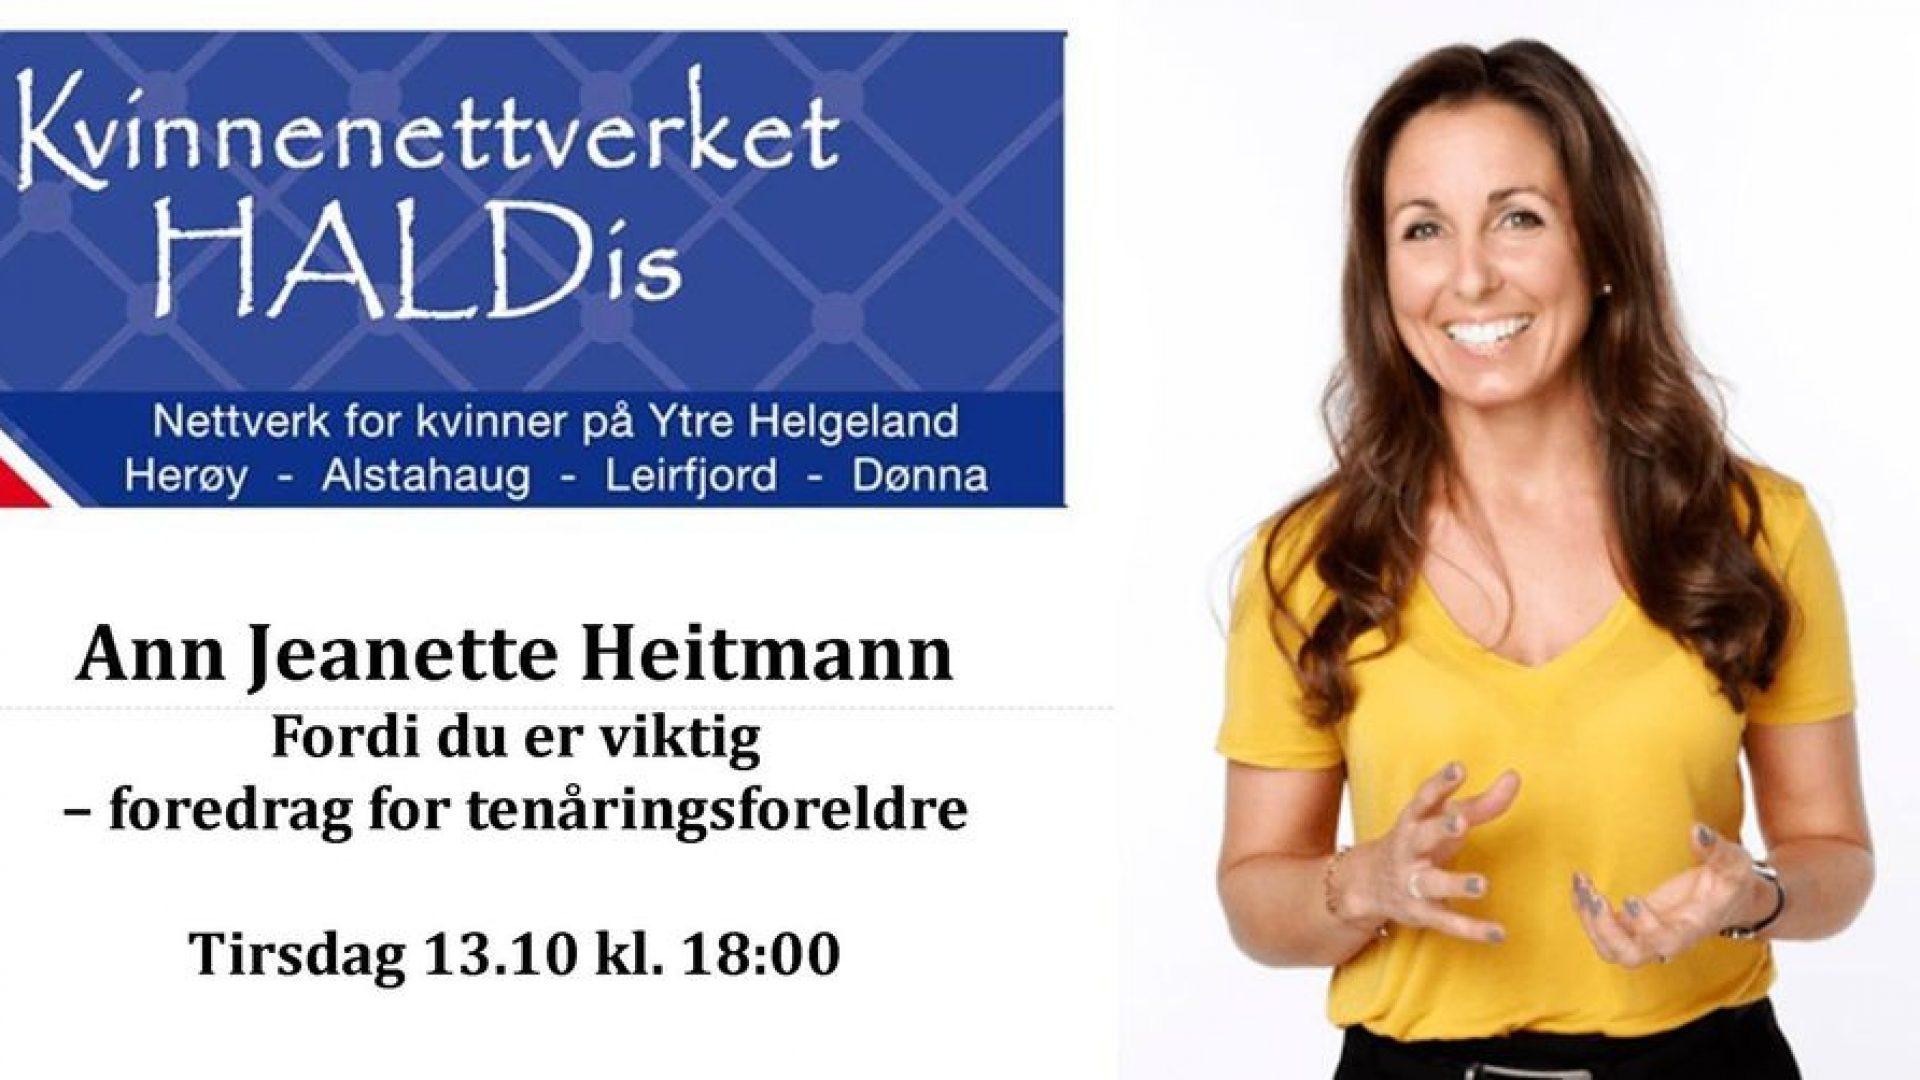 Ann Jeanette Heitmann